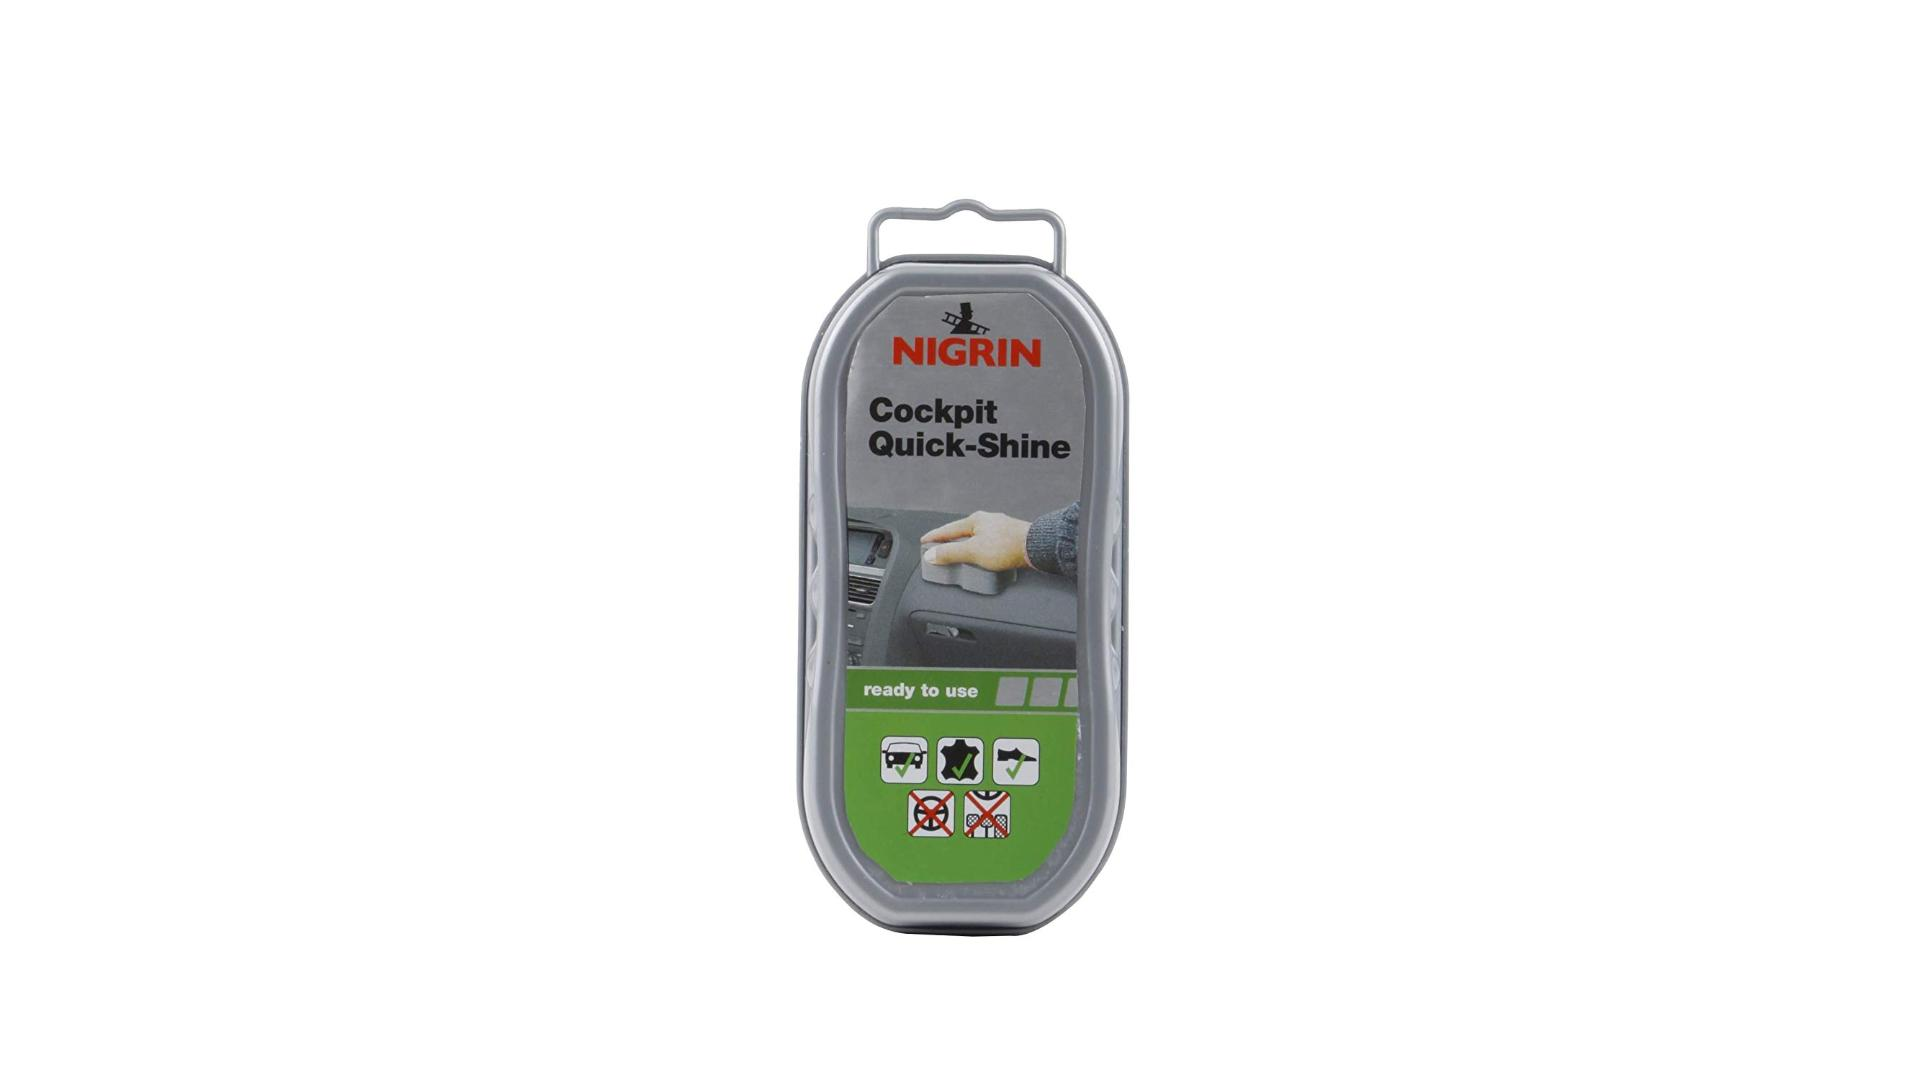 NIGRIN Cockpit spray - high shine